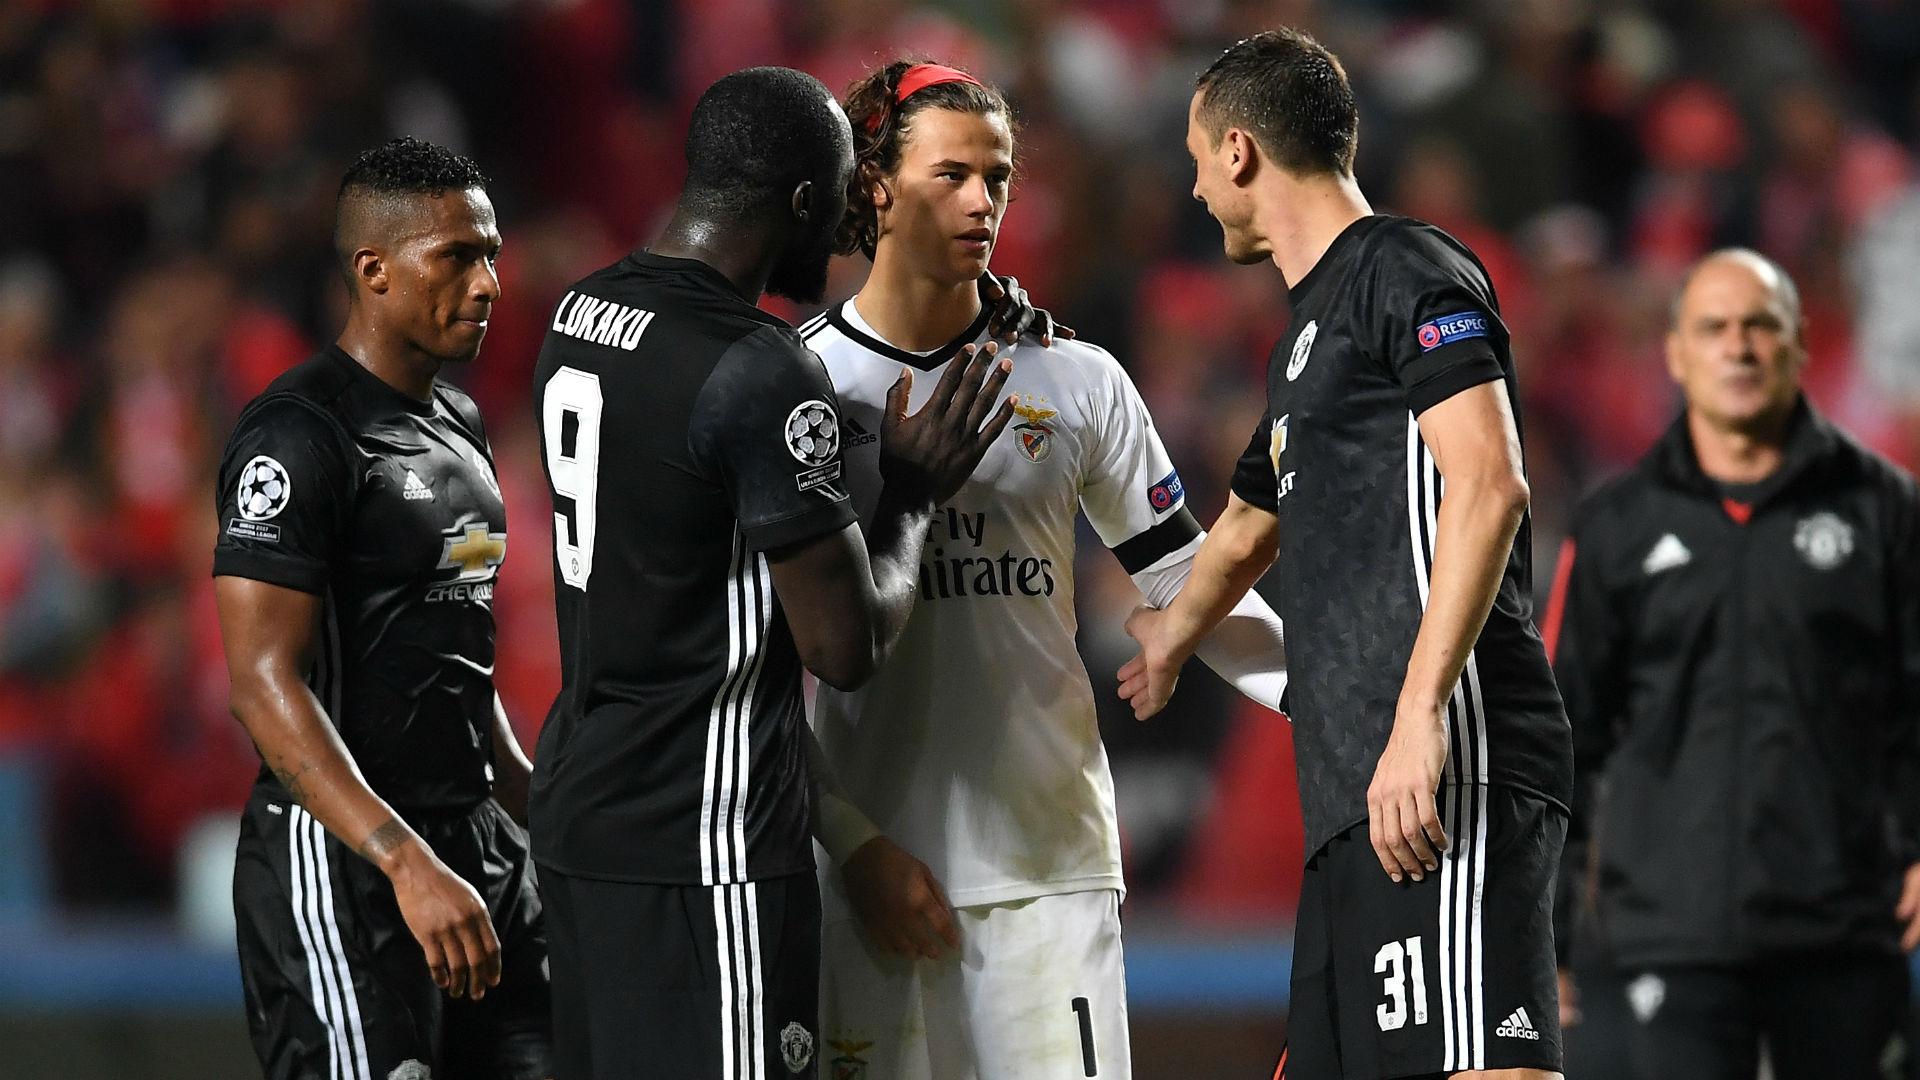 Romelu Lukaku Nemanja Matic Mile Svilar Manchester United Benfica Champions League